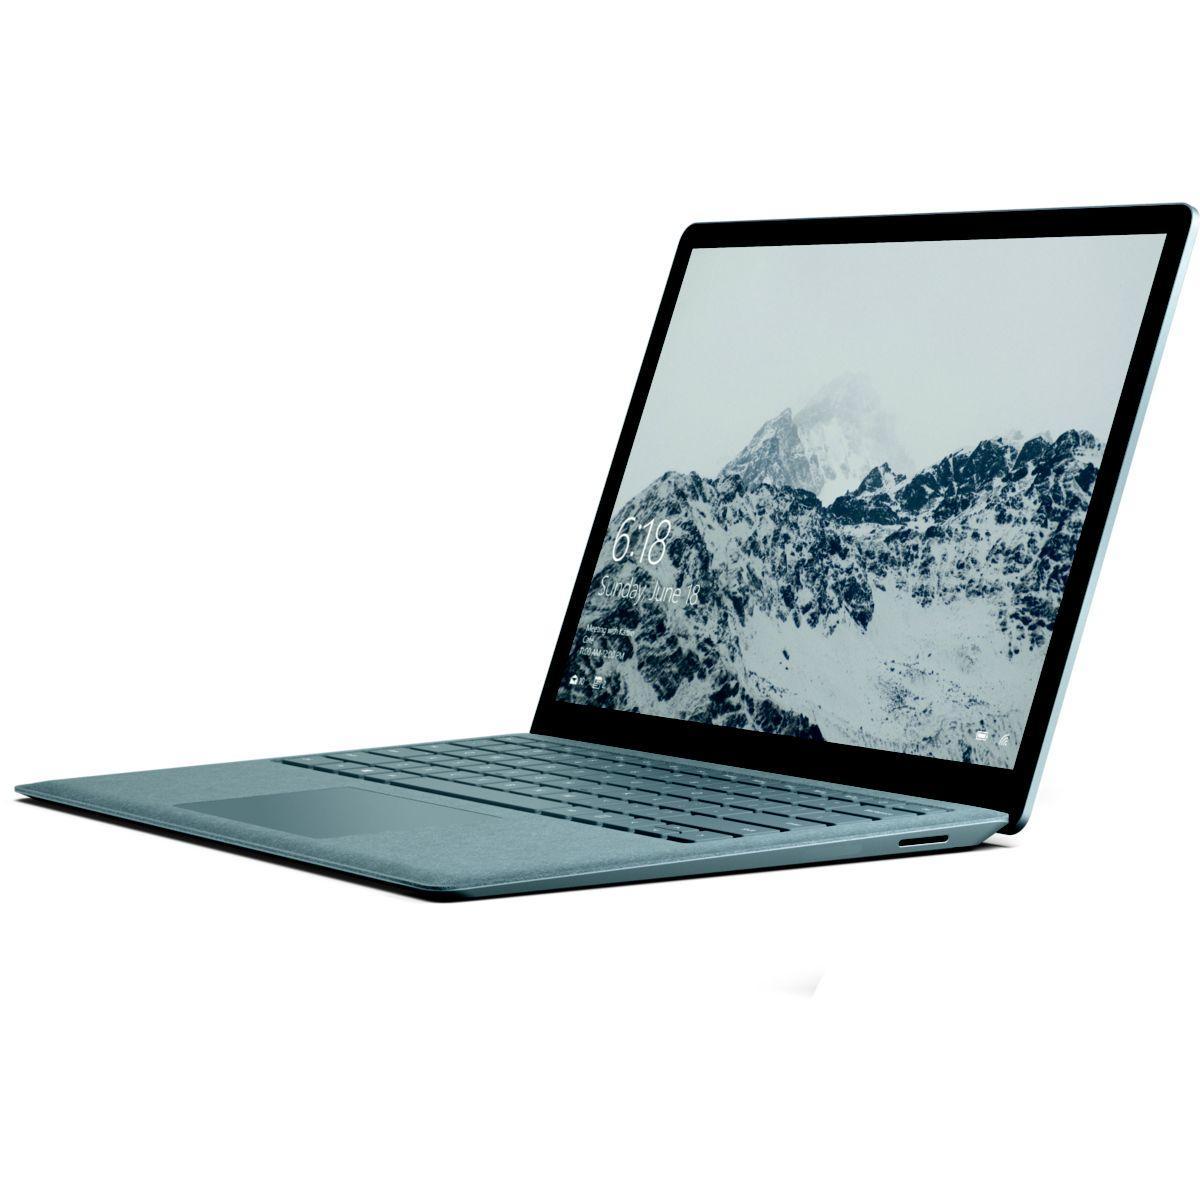 Ultra portable microsoft surface laptop i5 256go silver - livraison offerte : code chronoff